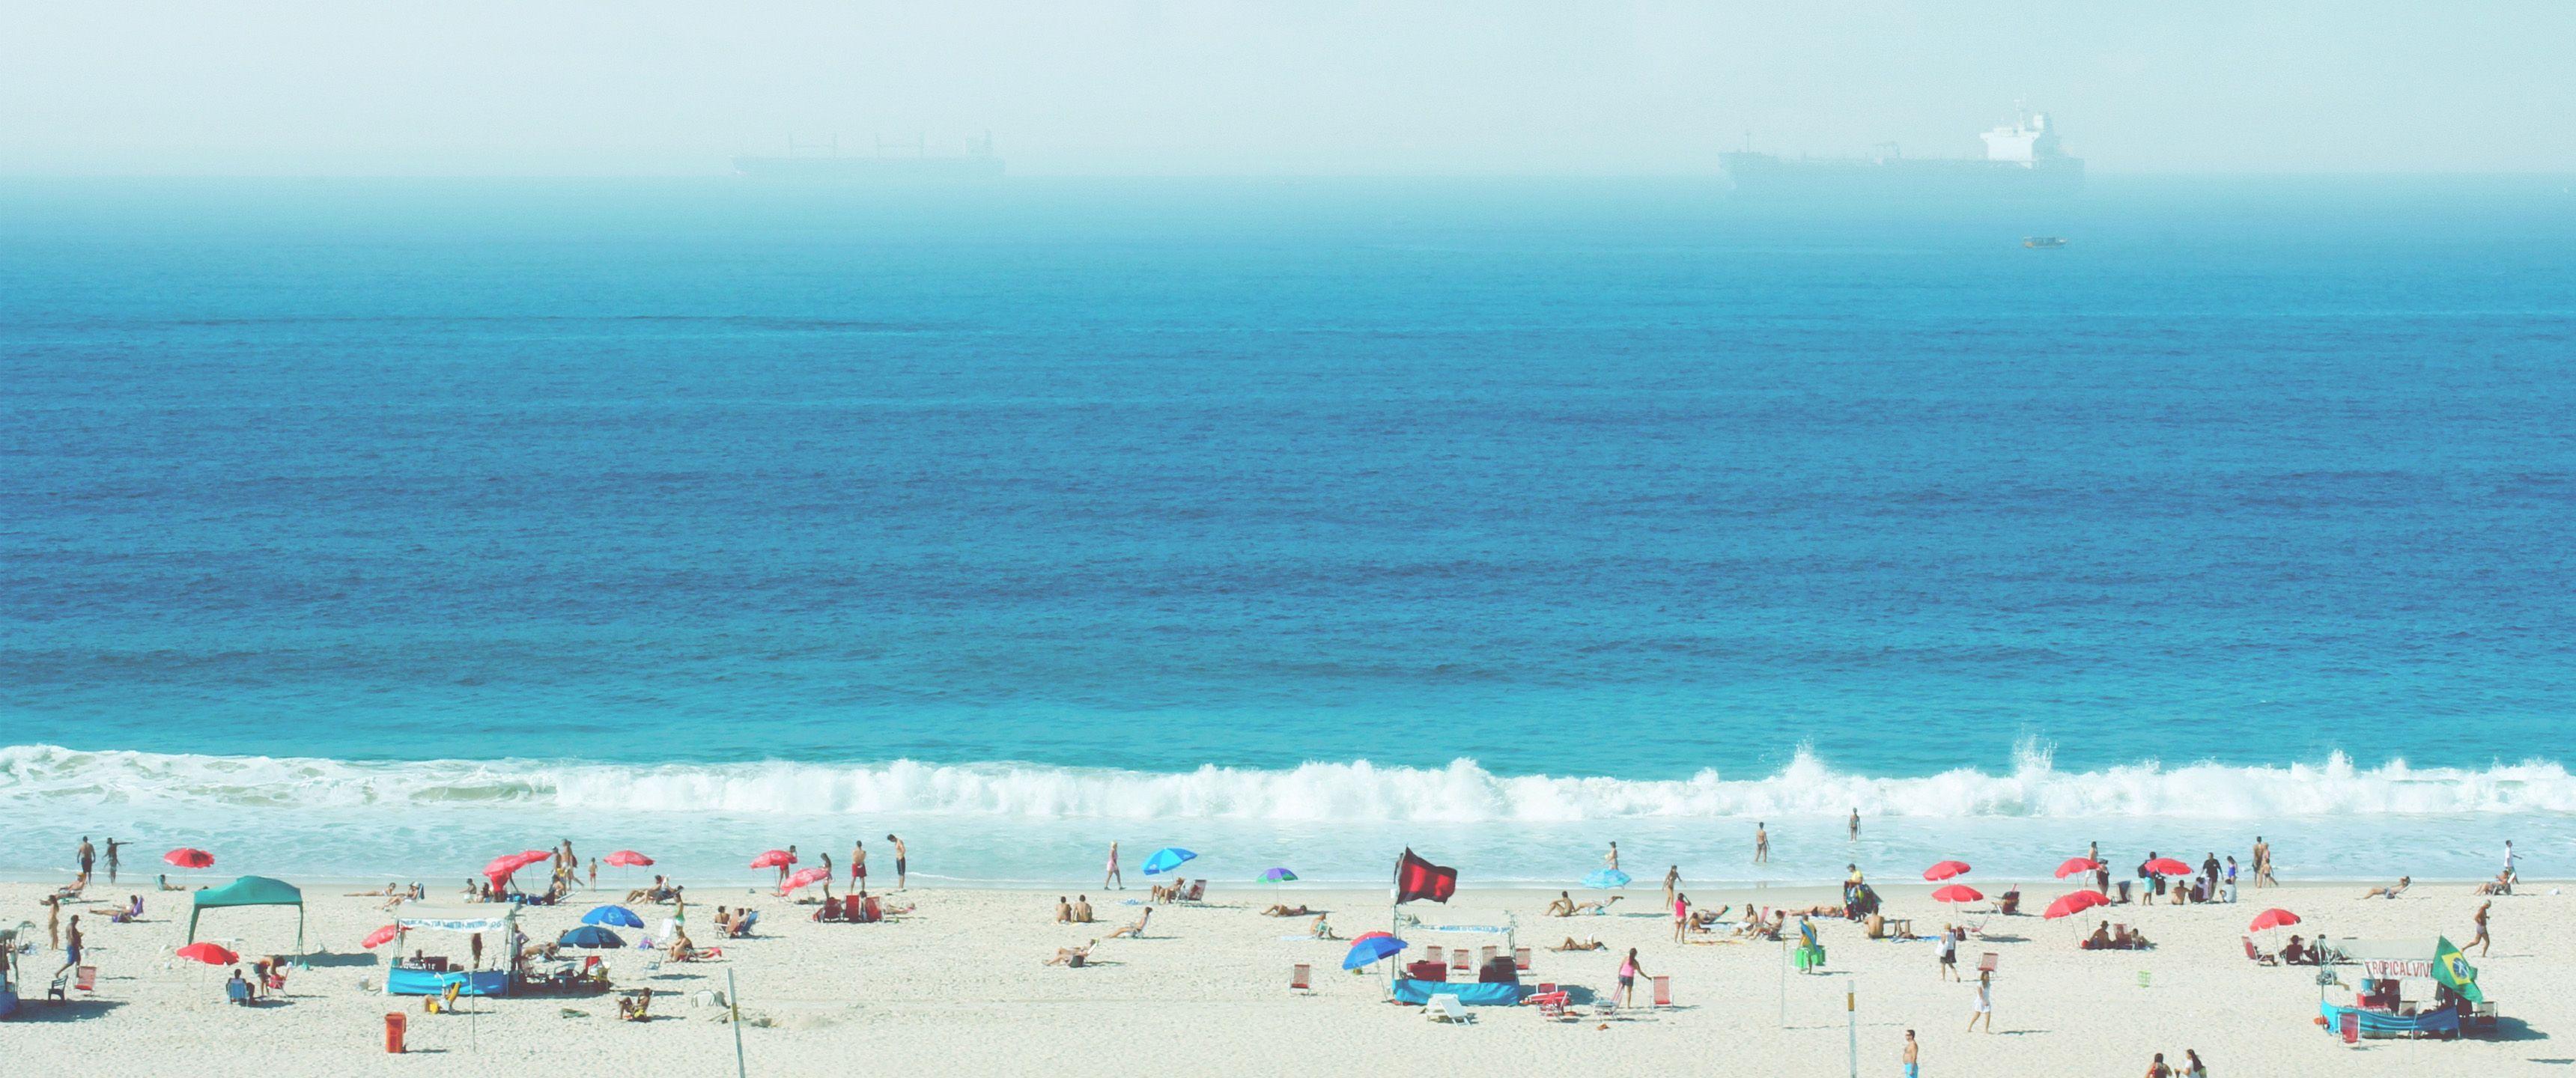 80's Beach 219 Ultrawide HD Wallpaper (3440x1440) 비치